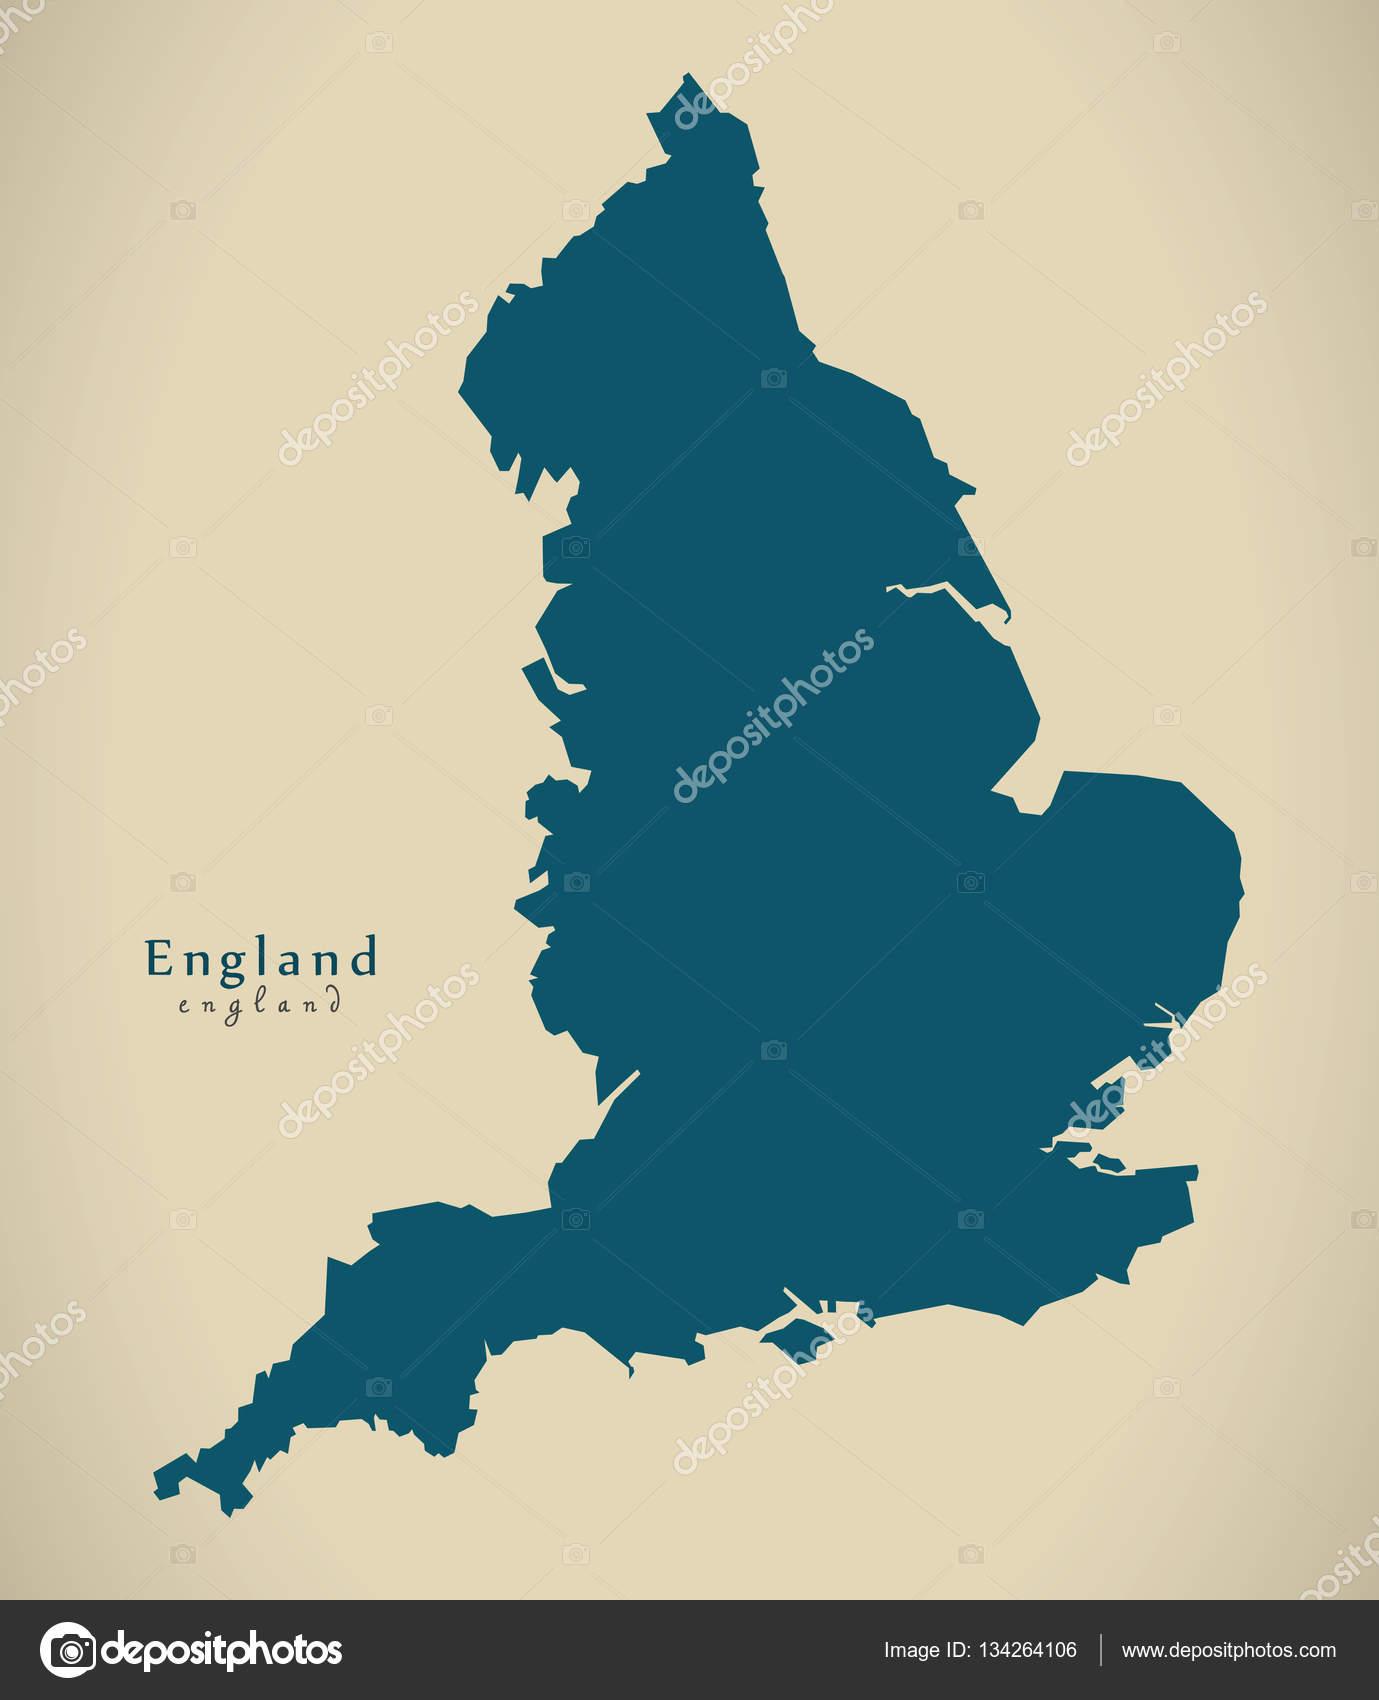 Karte Uk.Moderne Karte England Uk Stockfoto C Ingomenhard 134264106